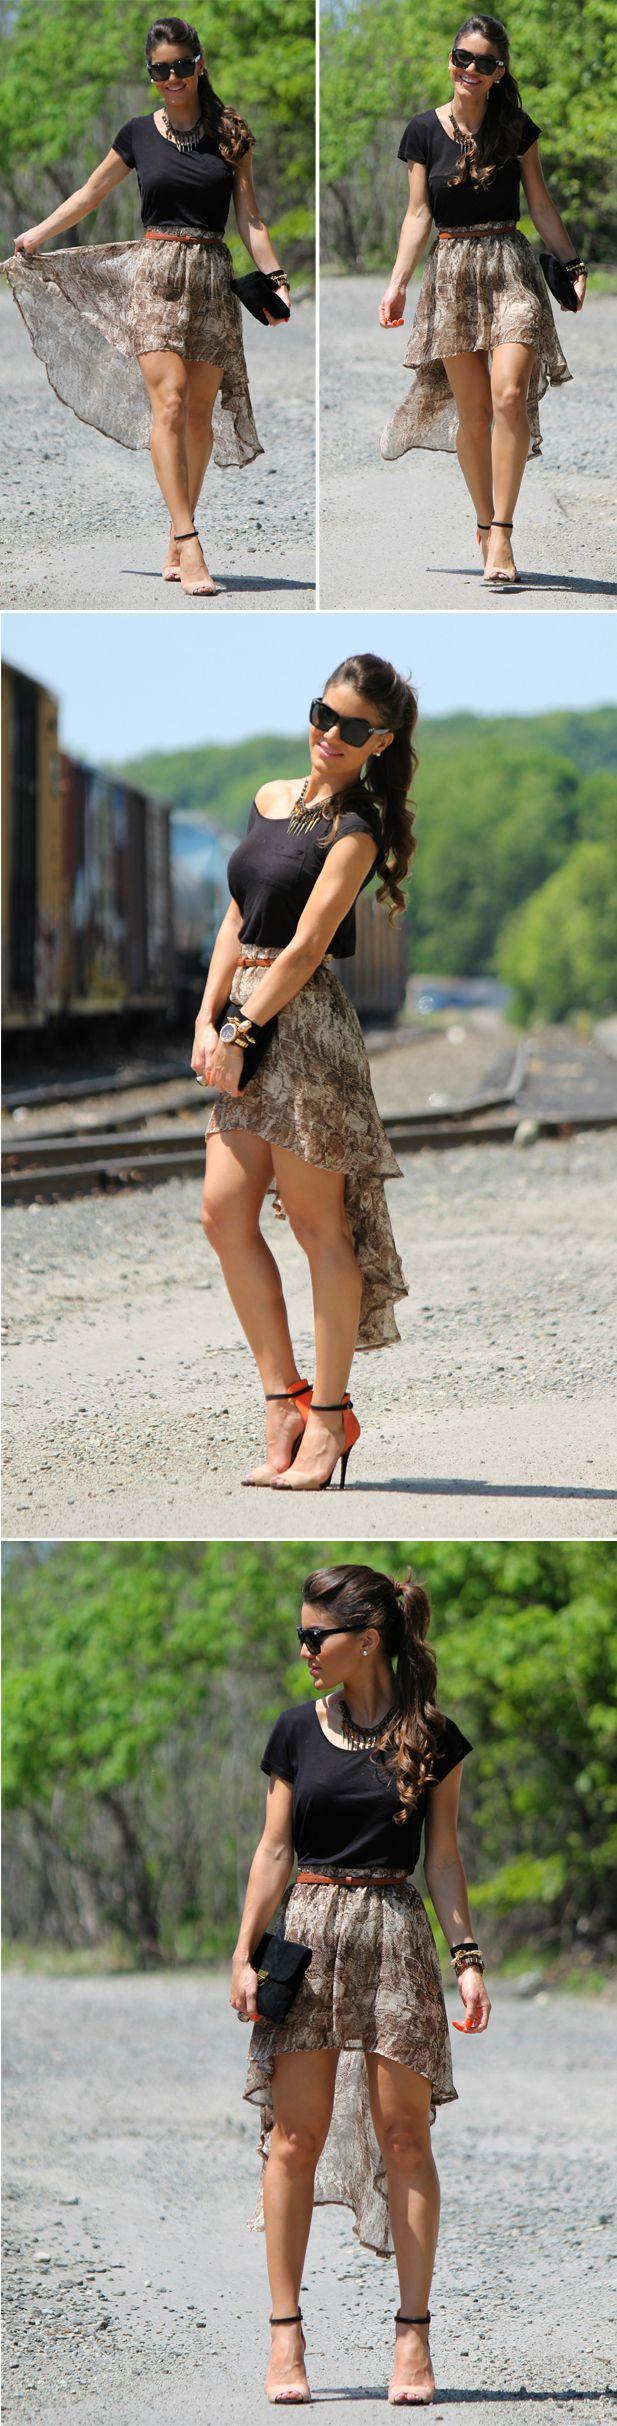 Wish I had cute legs i'd always wear skirts.